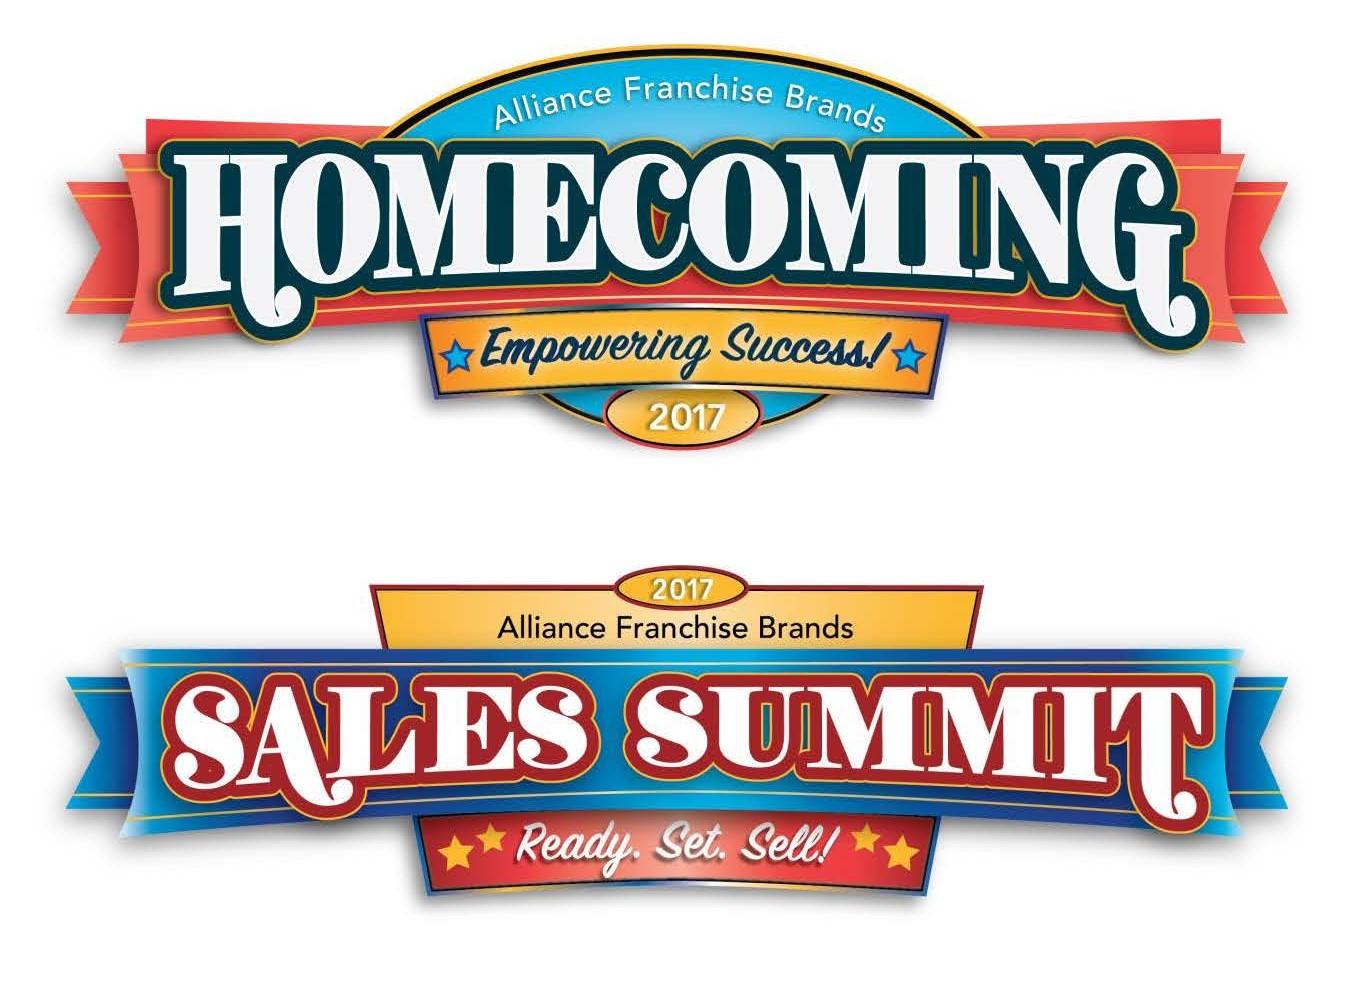 Vendor Registration for Homecoming & Sales Summit 2017